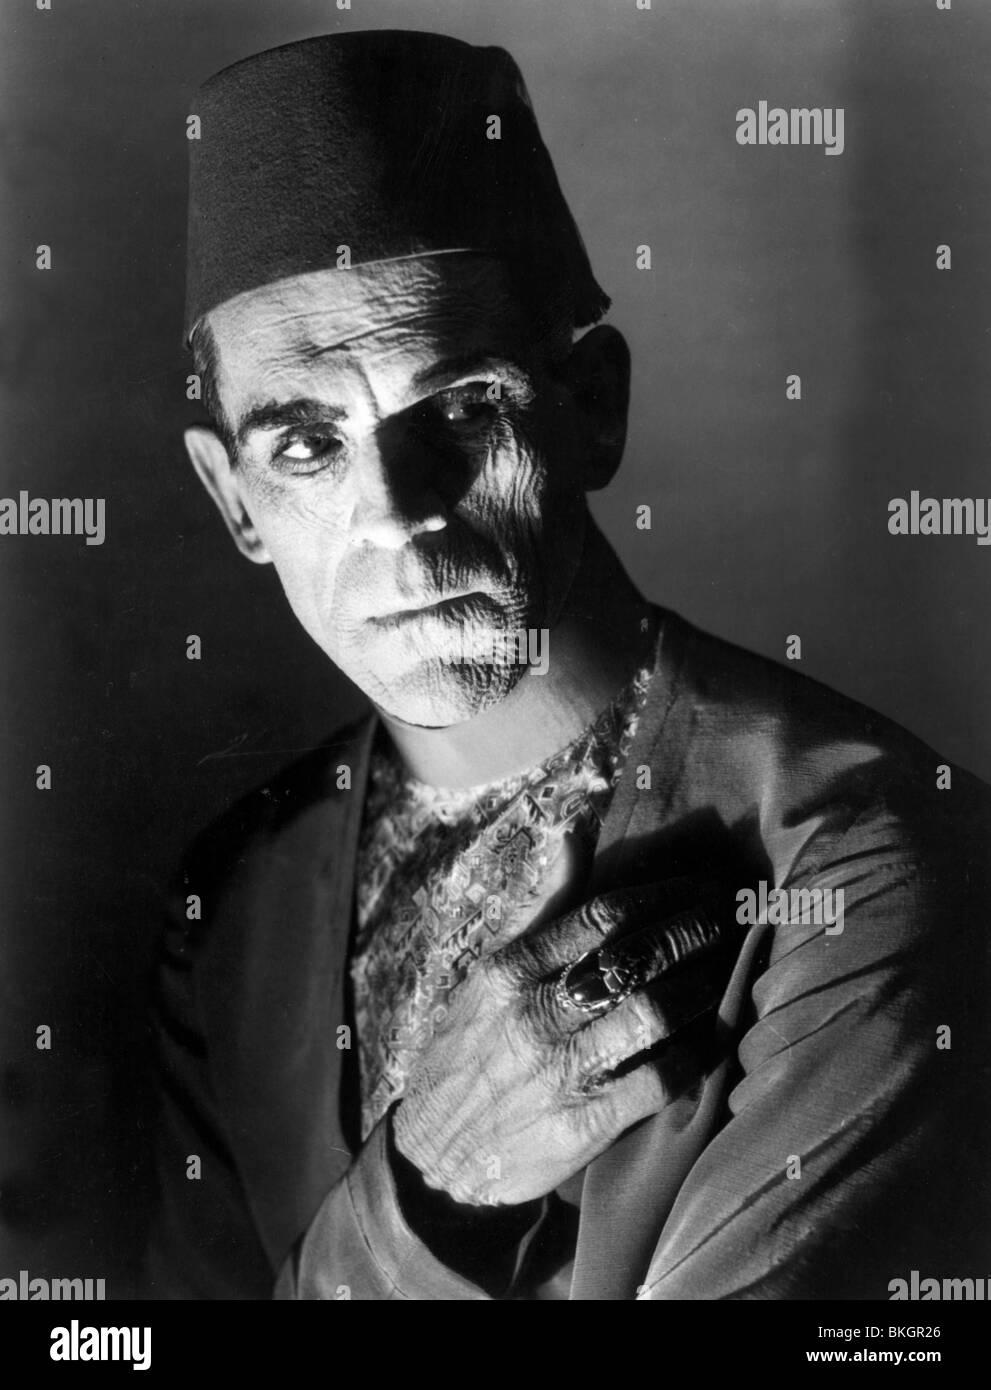 THE MUMMY -1932 BORIS KARLOFF - Stock Image